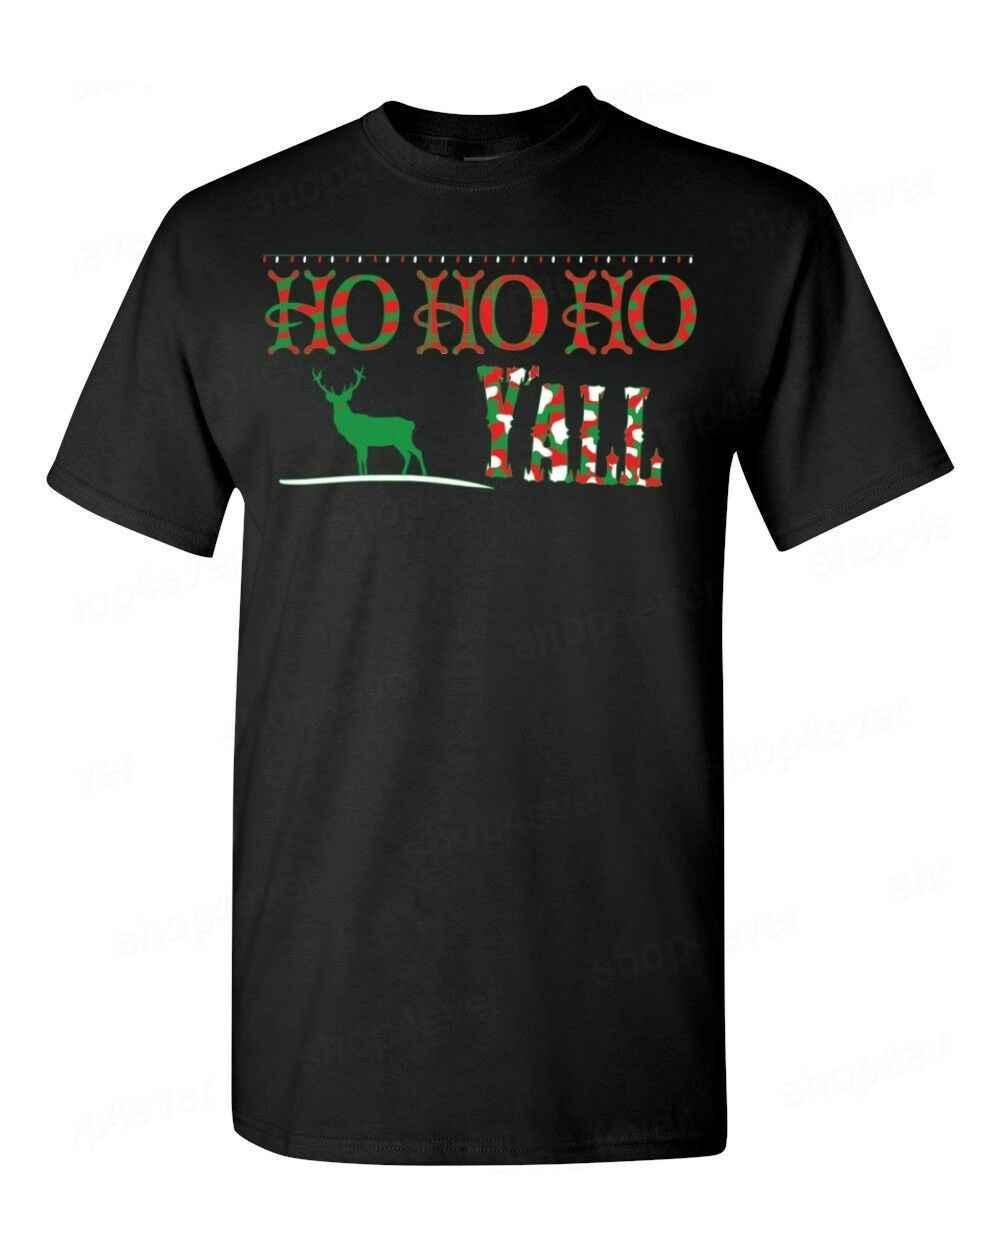 Ho Ho Ho Y'all T-Shirt Grappige Lelijke Kerst Vakantie Feestelijke Rendier Santa Tees2019 modieuze Merk 100% katoen Gedrukt Ronde N